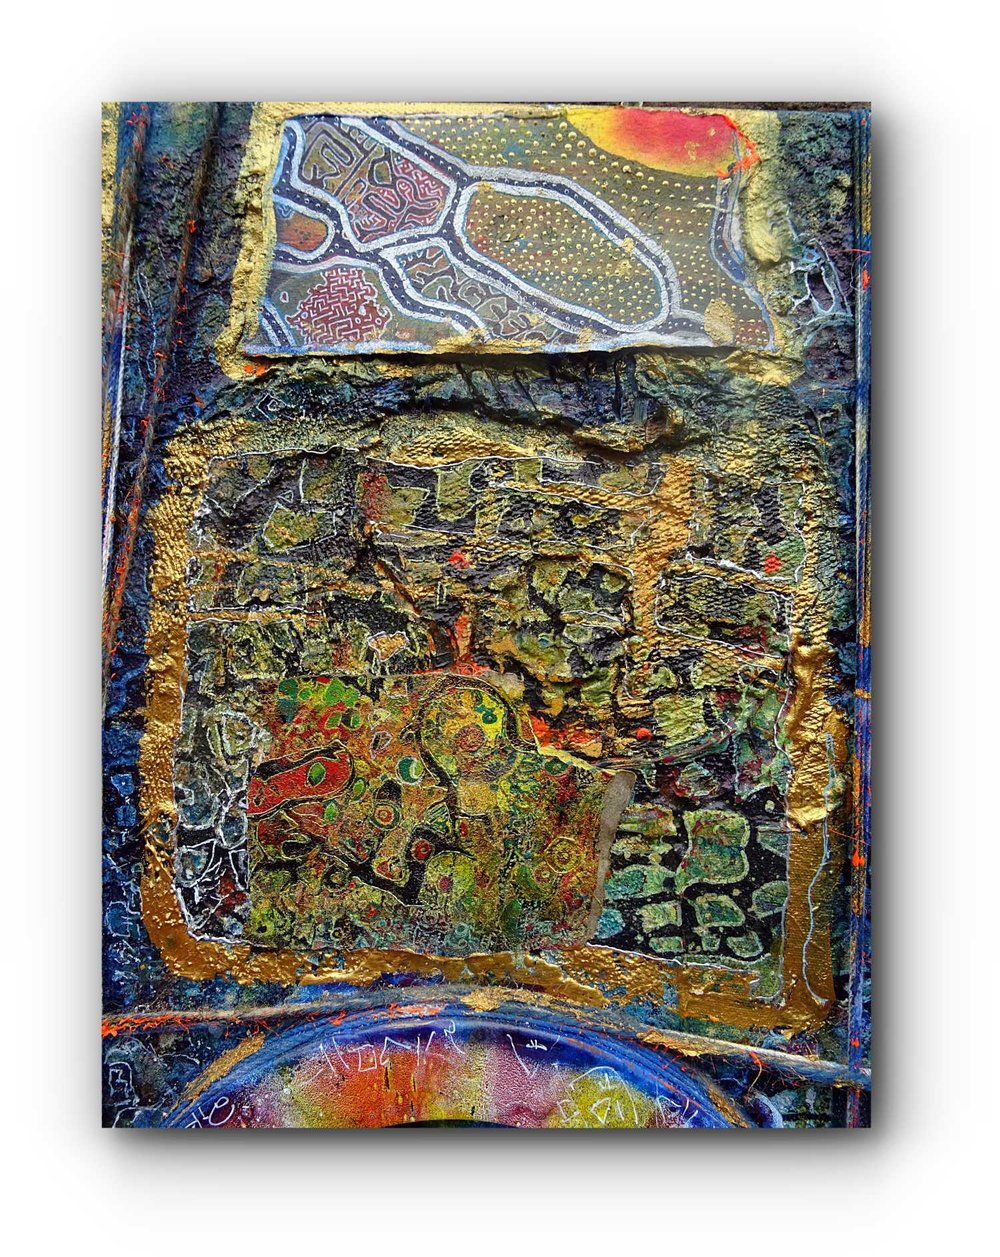 painting-detail-5-portal-artist-duo-ingress-vortices.jpg